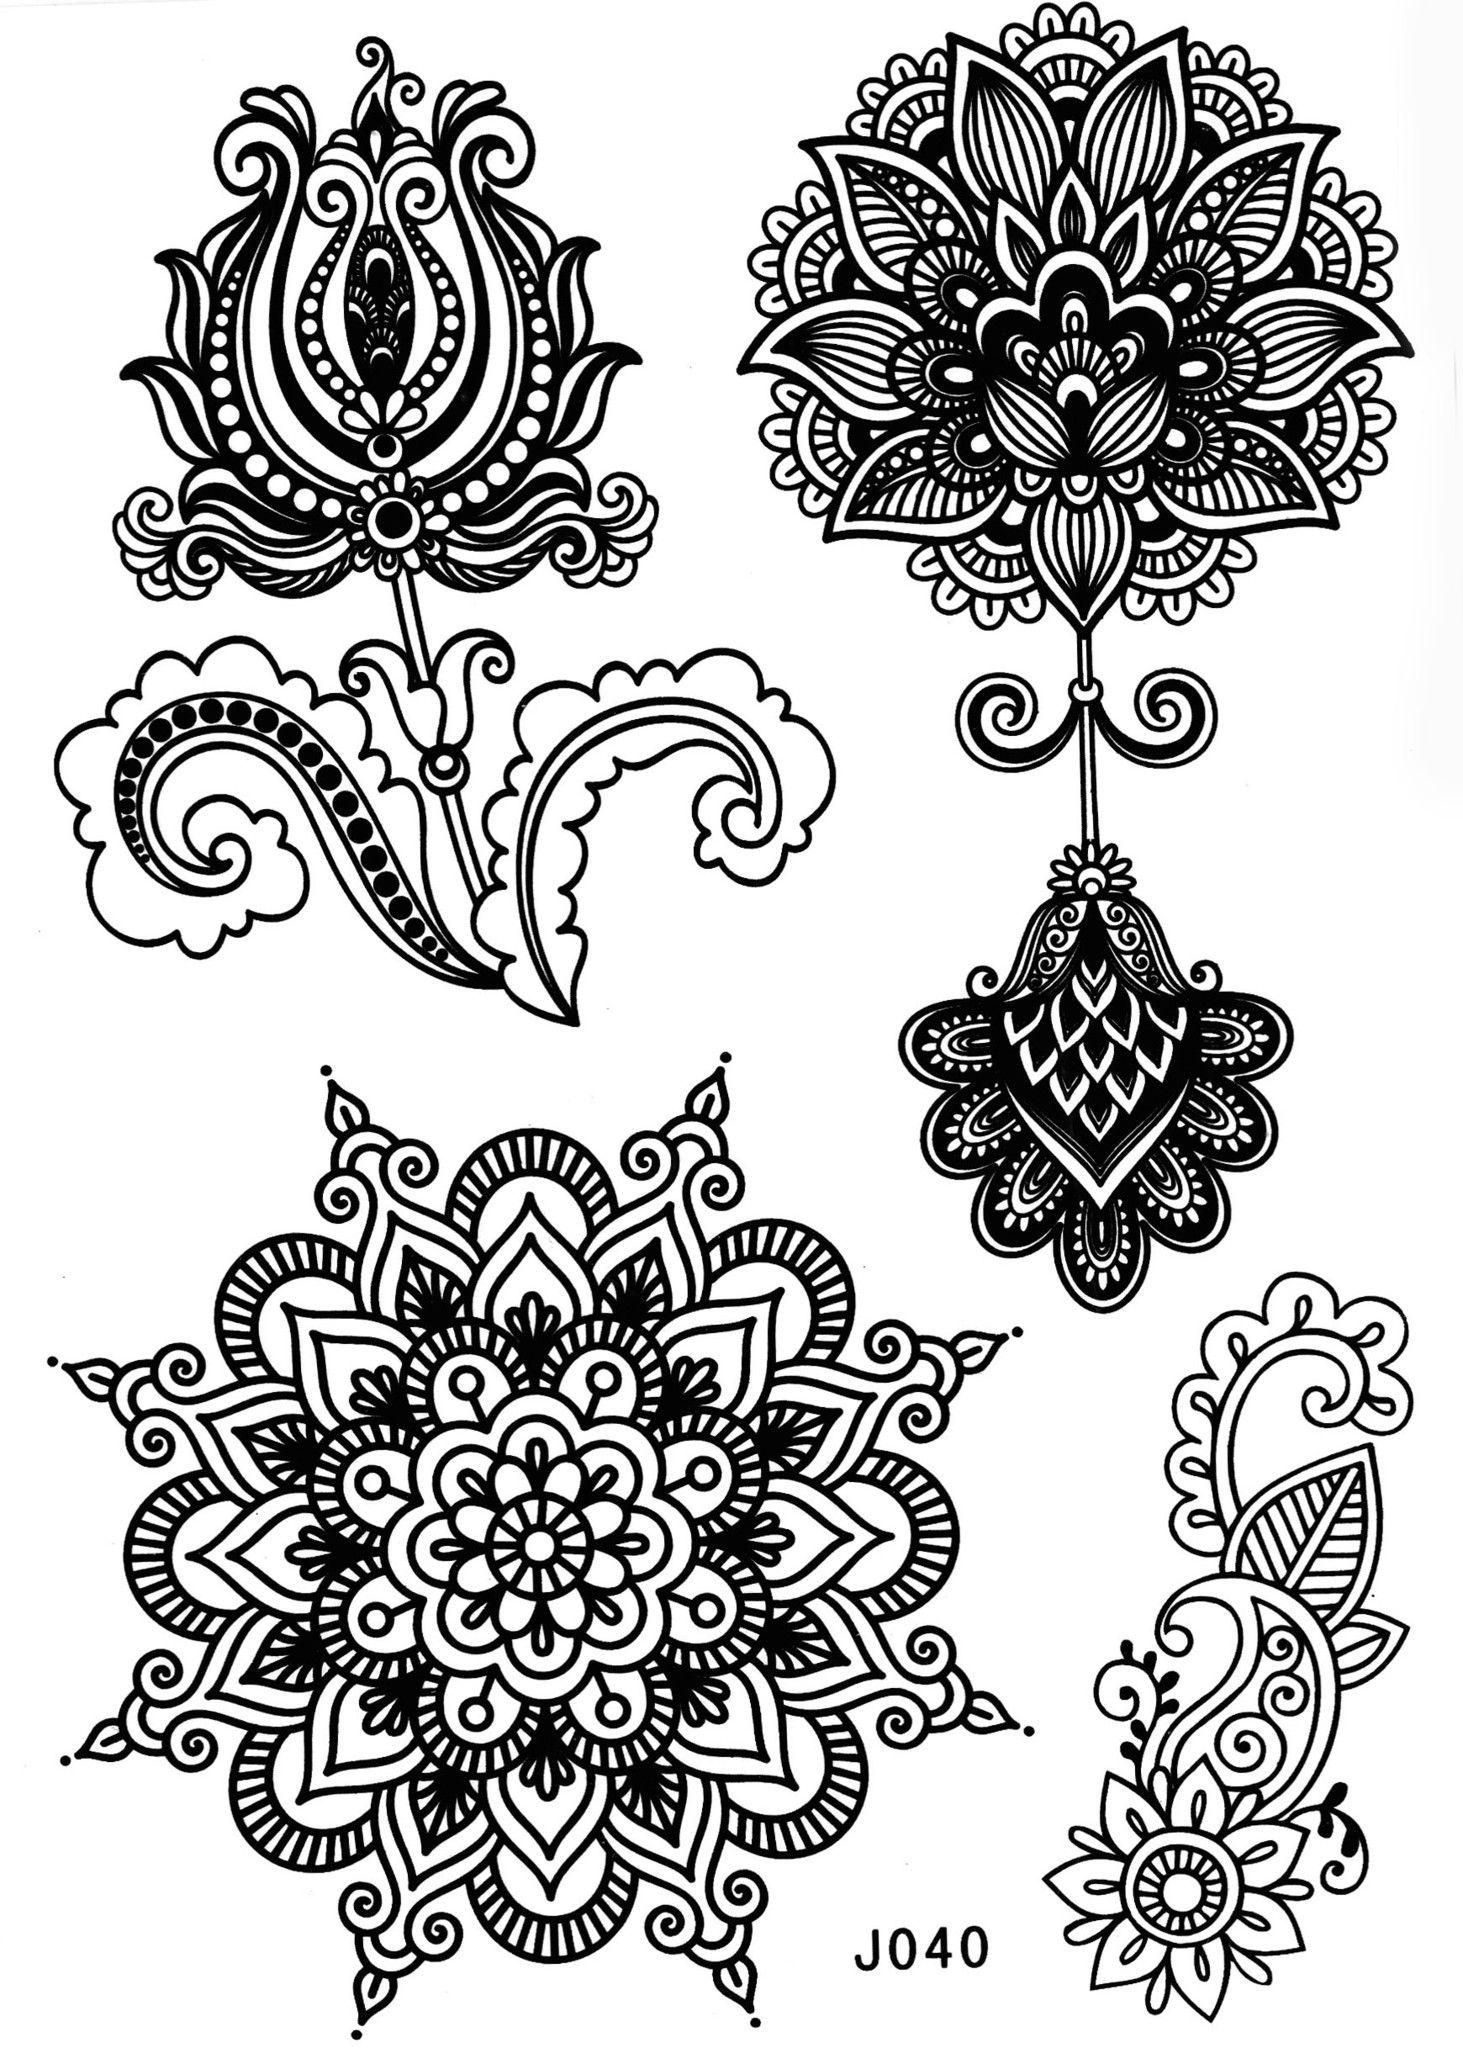 aponi black henna mandala temporary tattoo zeichen. Black Bedroom Furniture Sets. Home Design Ideas